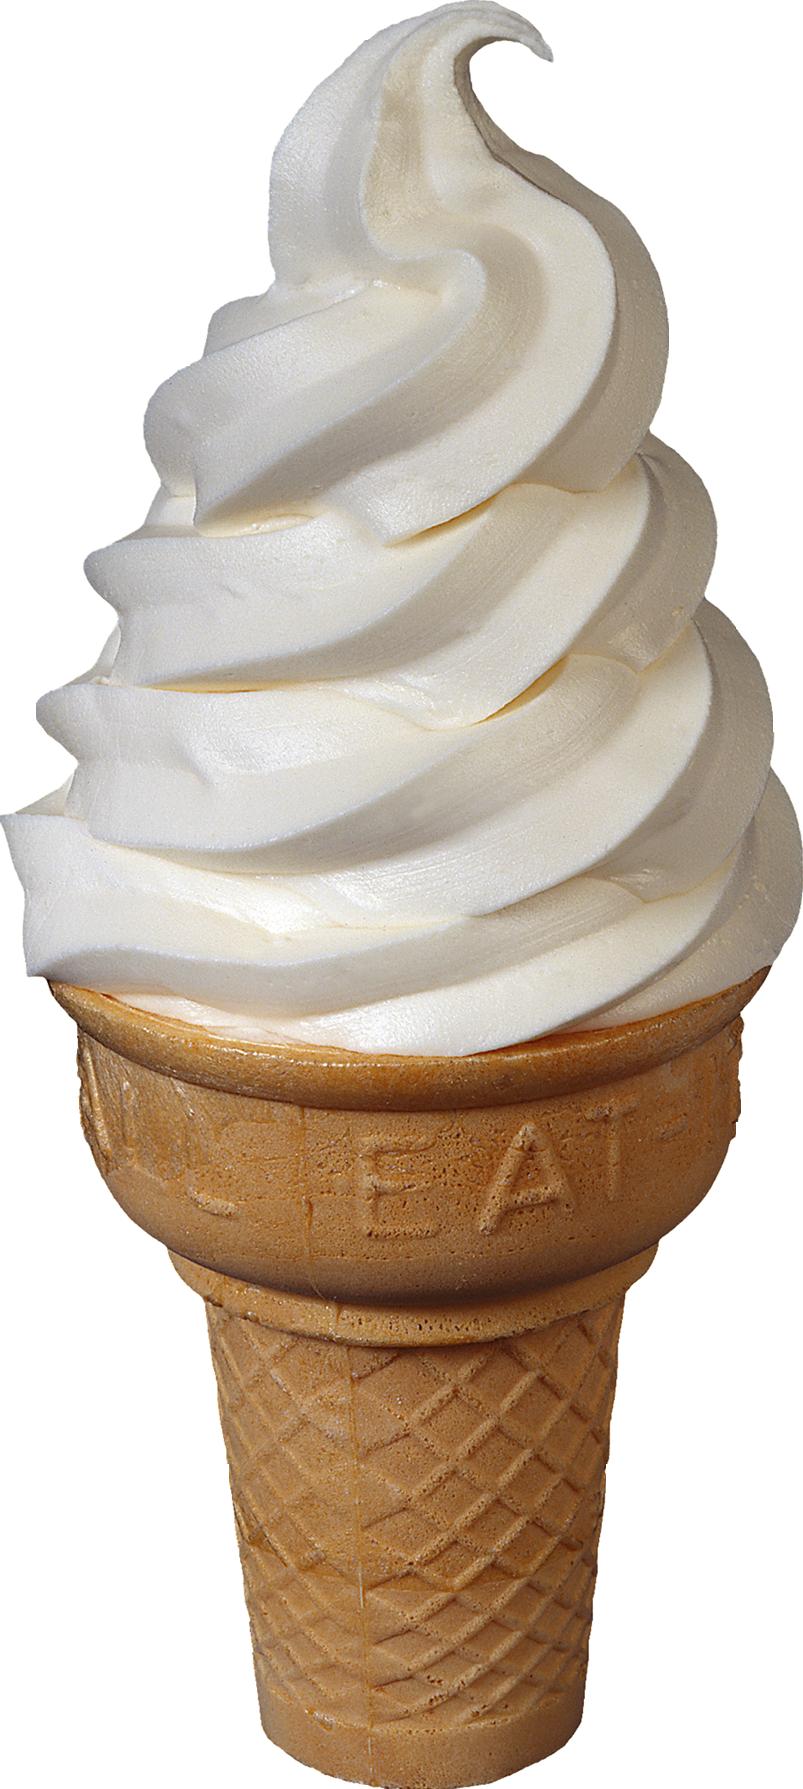 Ice Cream Png Image